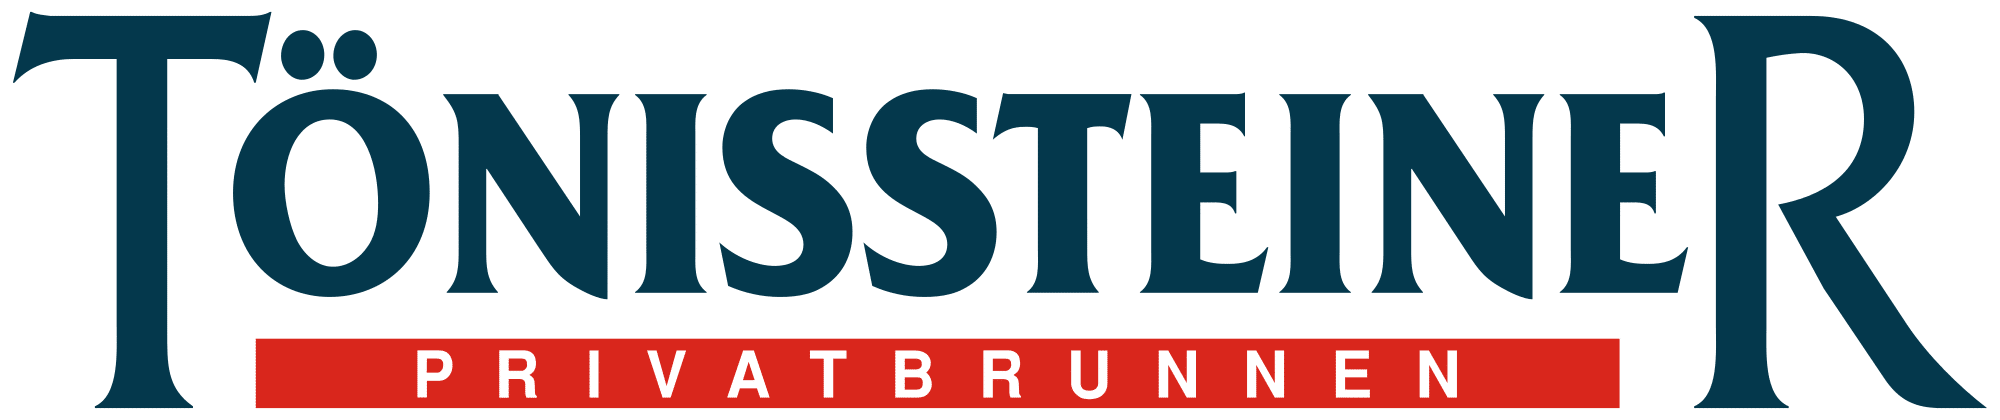 Privatbrunnen TÖNISSTEINER Sprudel Dr. C. Kerstiens GmbH Heilbrunnen D-56656 Brohl-Lützing https://www.toenissteiner.com/